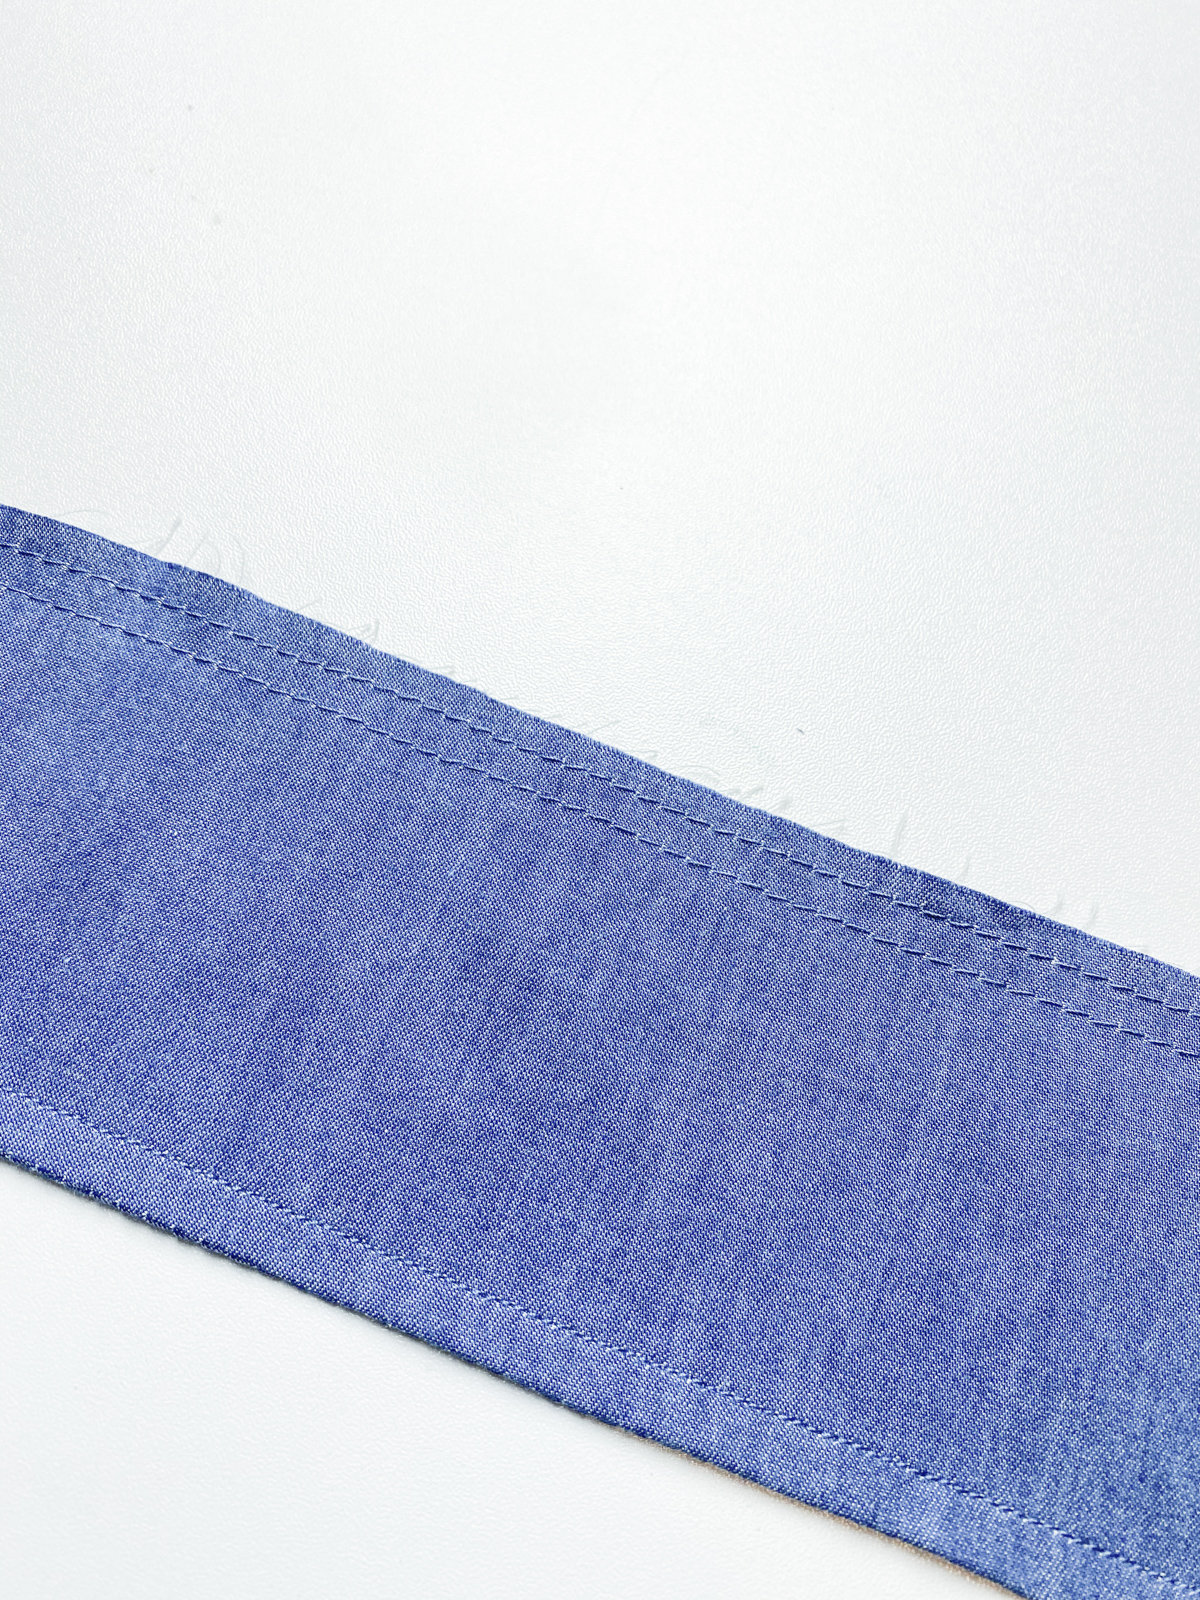 How to add a ruffle sleeve hem to the Mini Darling Ranges dress // Step 8